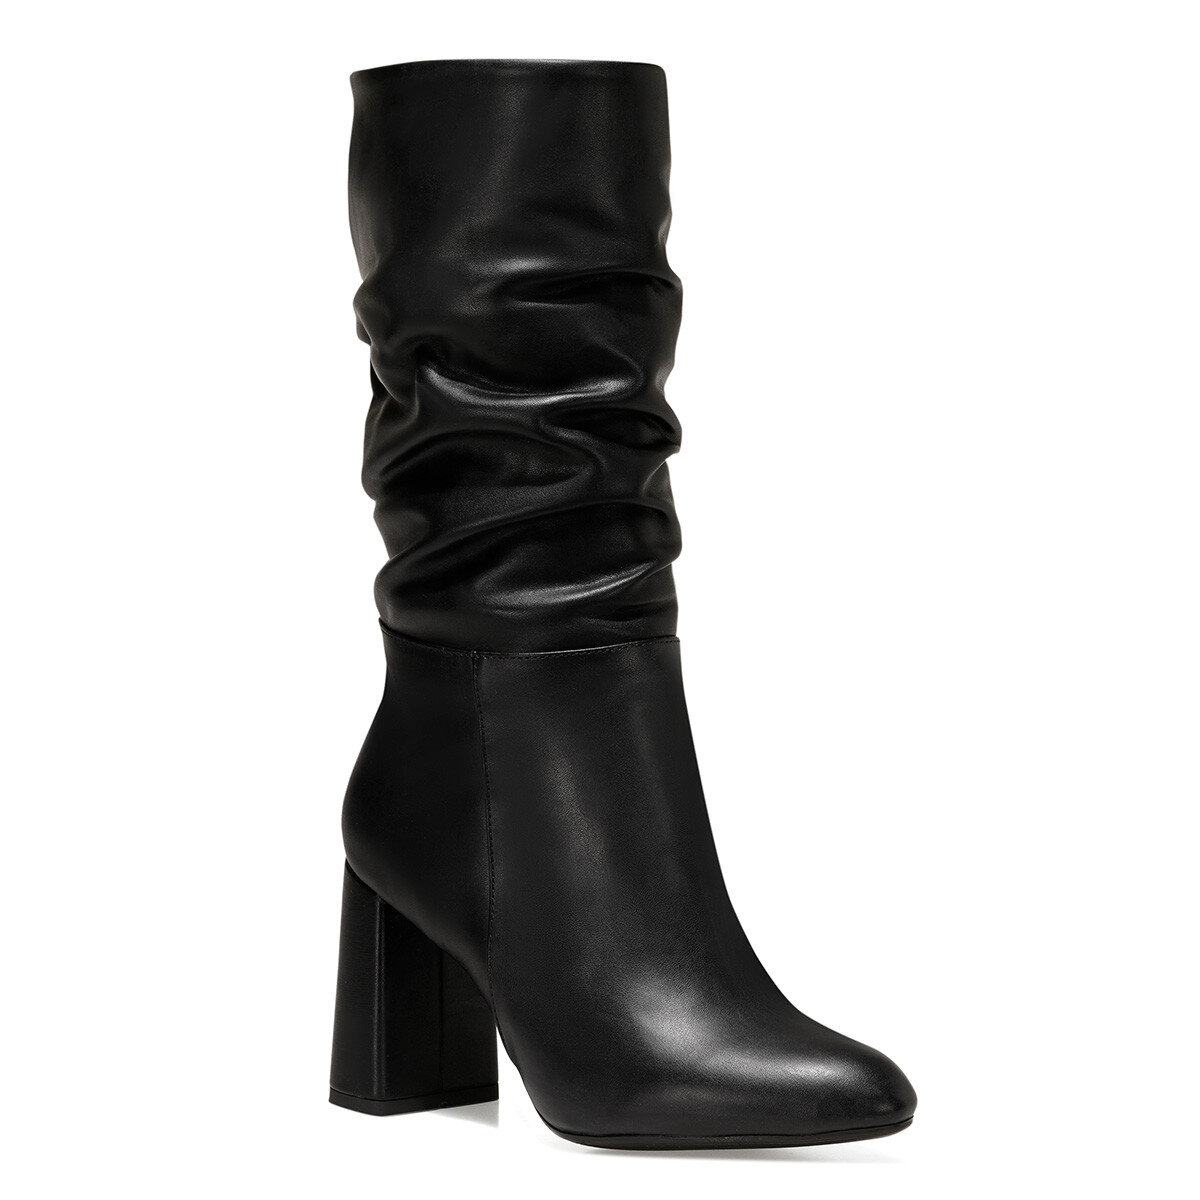 UMBRIA Siyah Kadın Topuklu Çizme